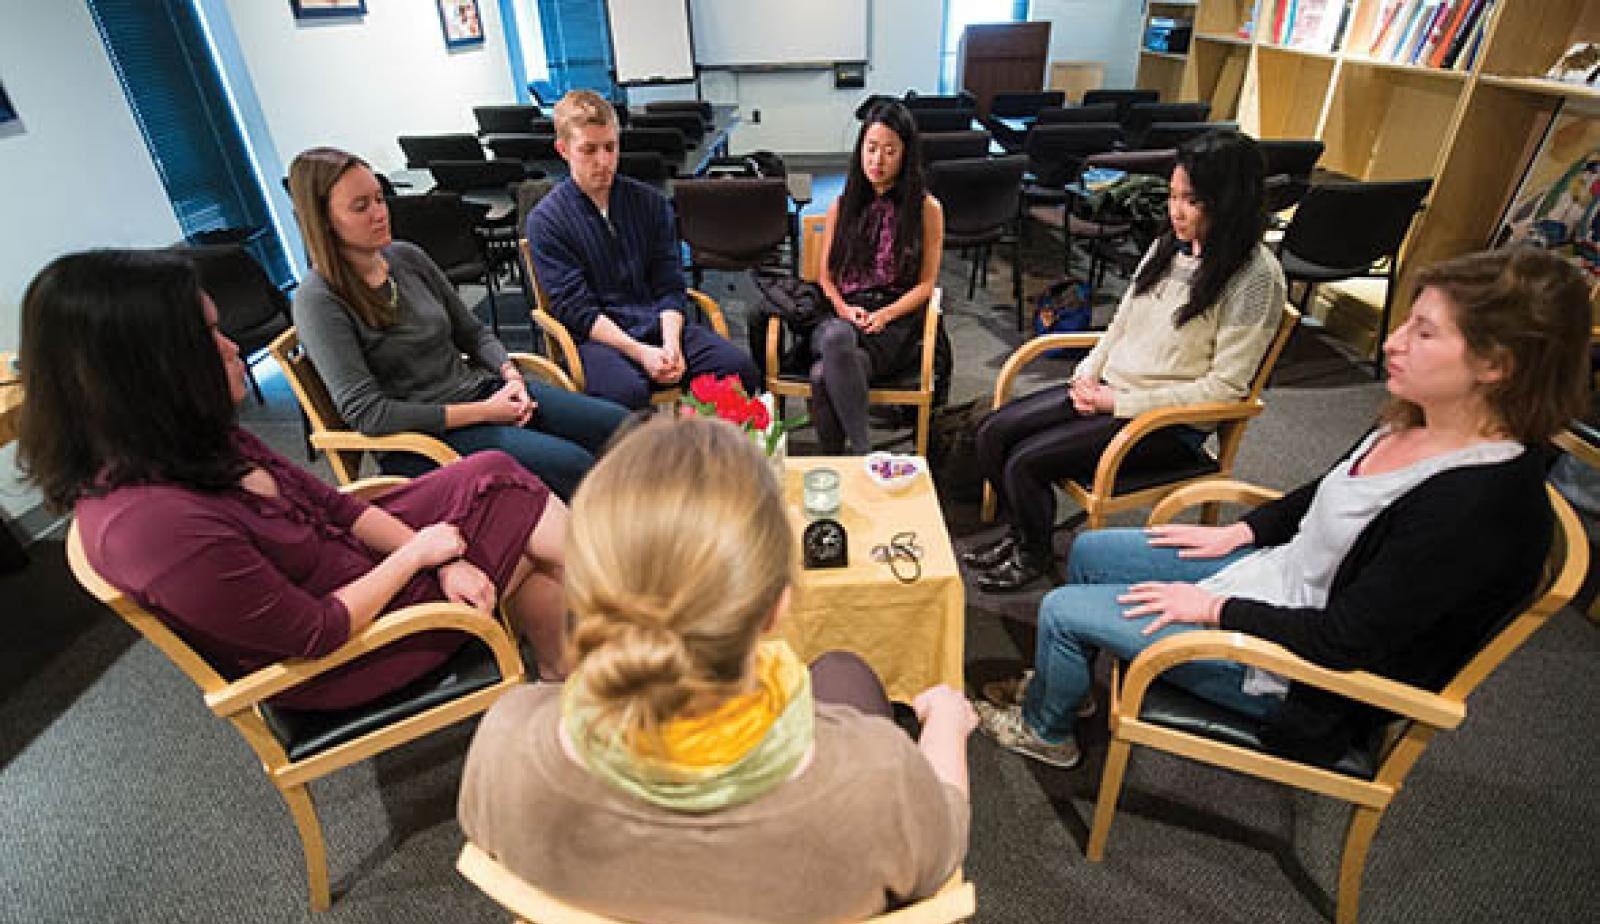 Mind-body medicine session with meditation